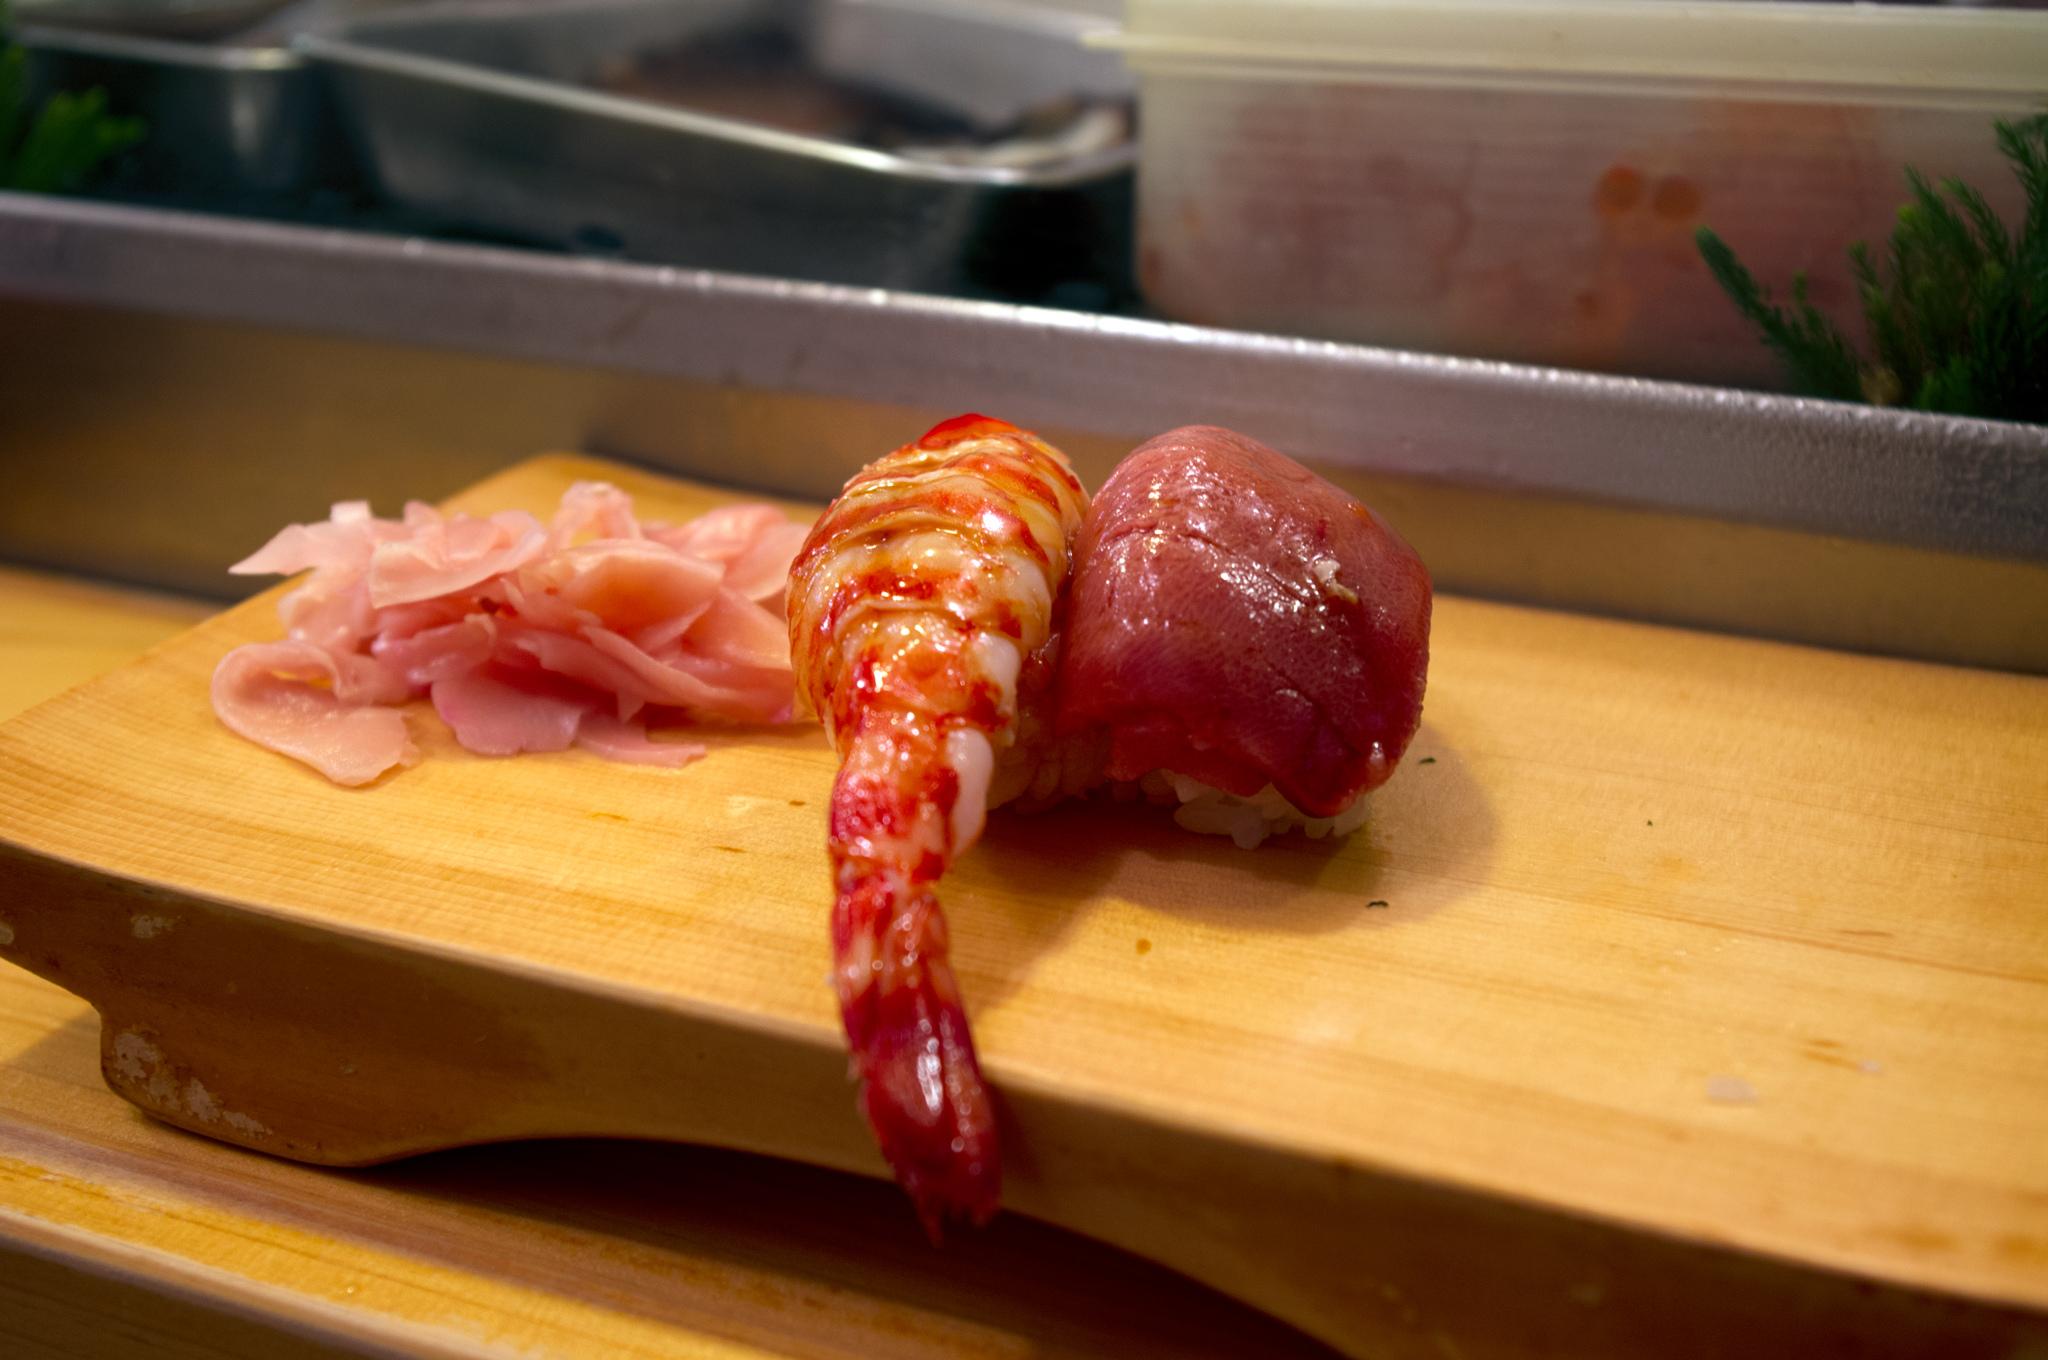 Sushi at Daiwa Sushi in Tokyo. Photo by alphacityguides.